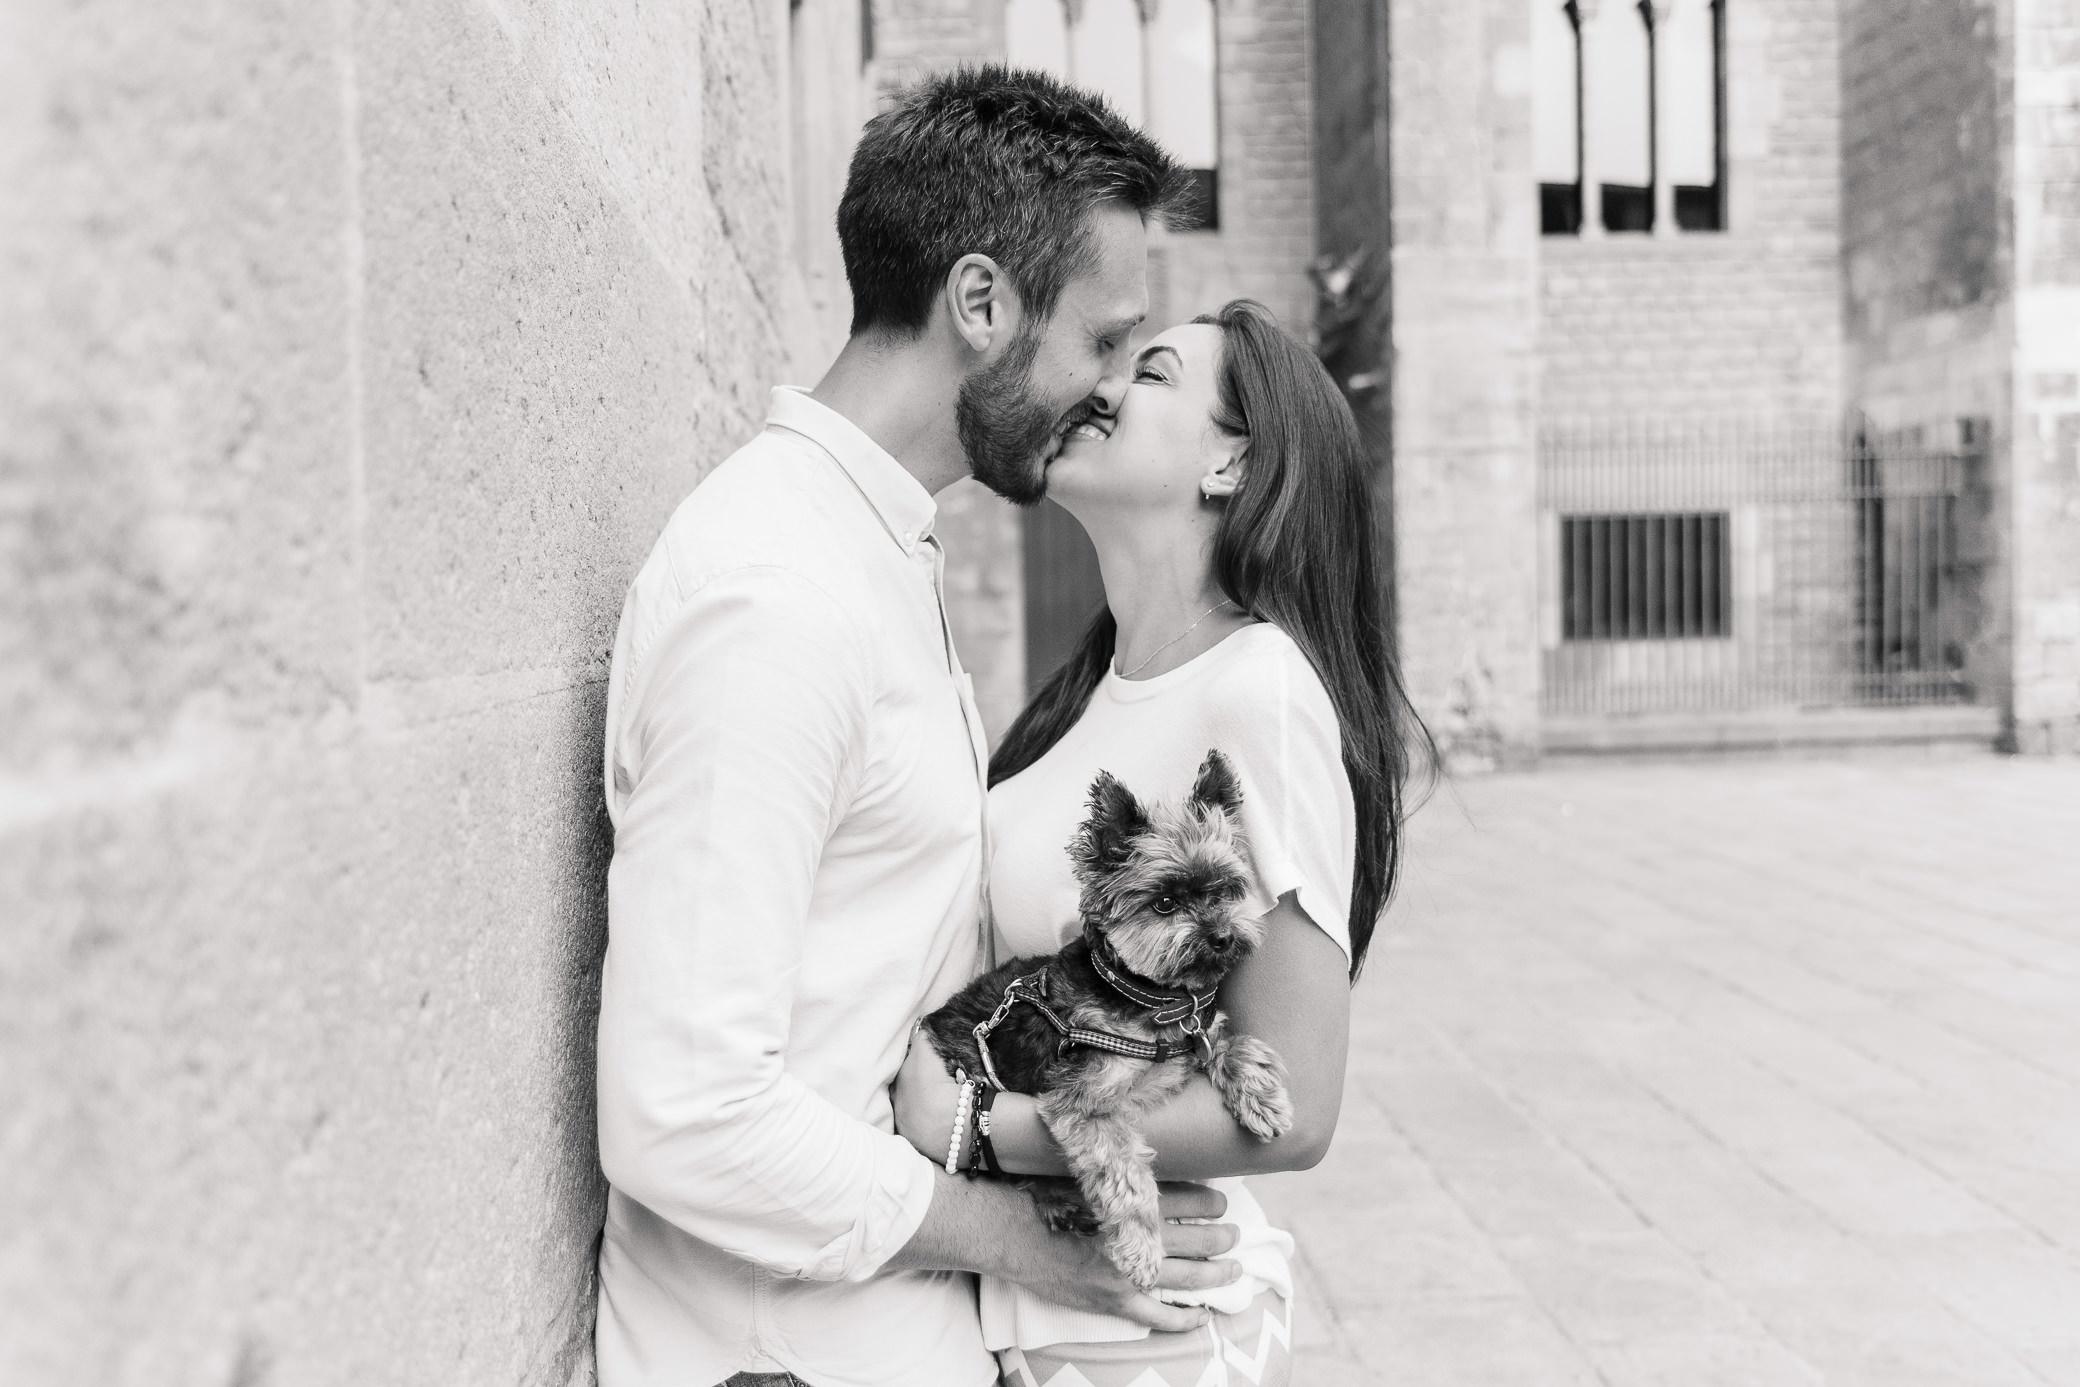 preboda-en-barcelona-born-destination-wedding-photografeel-11.jpg